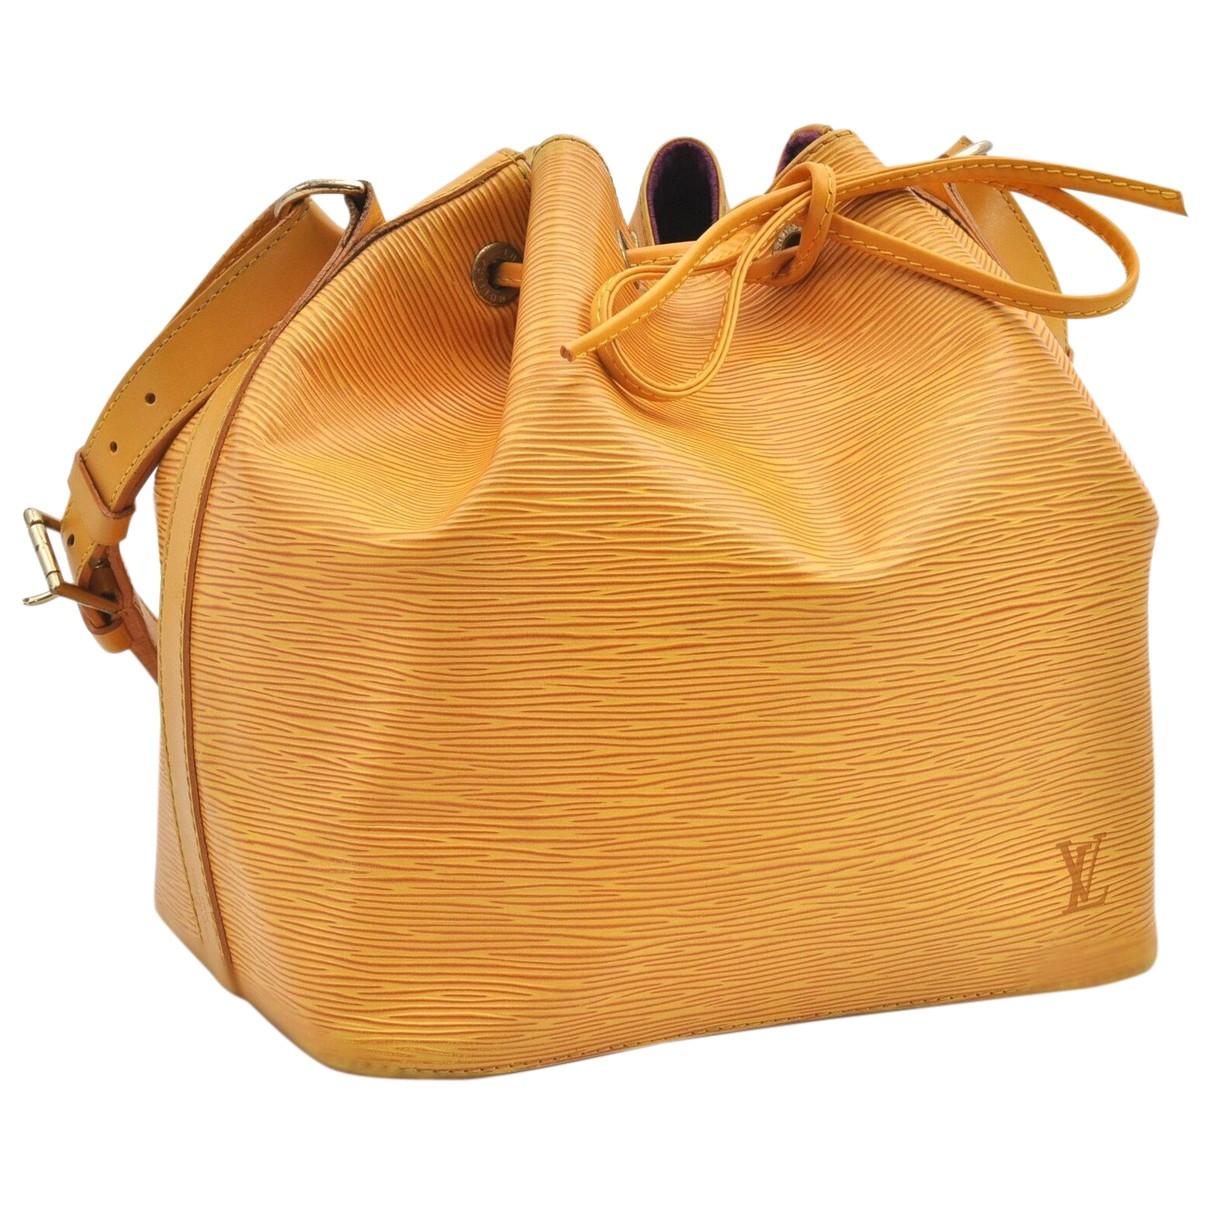 Louis Vuitton Noé Yellow Leather handbag for Women N